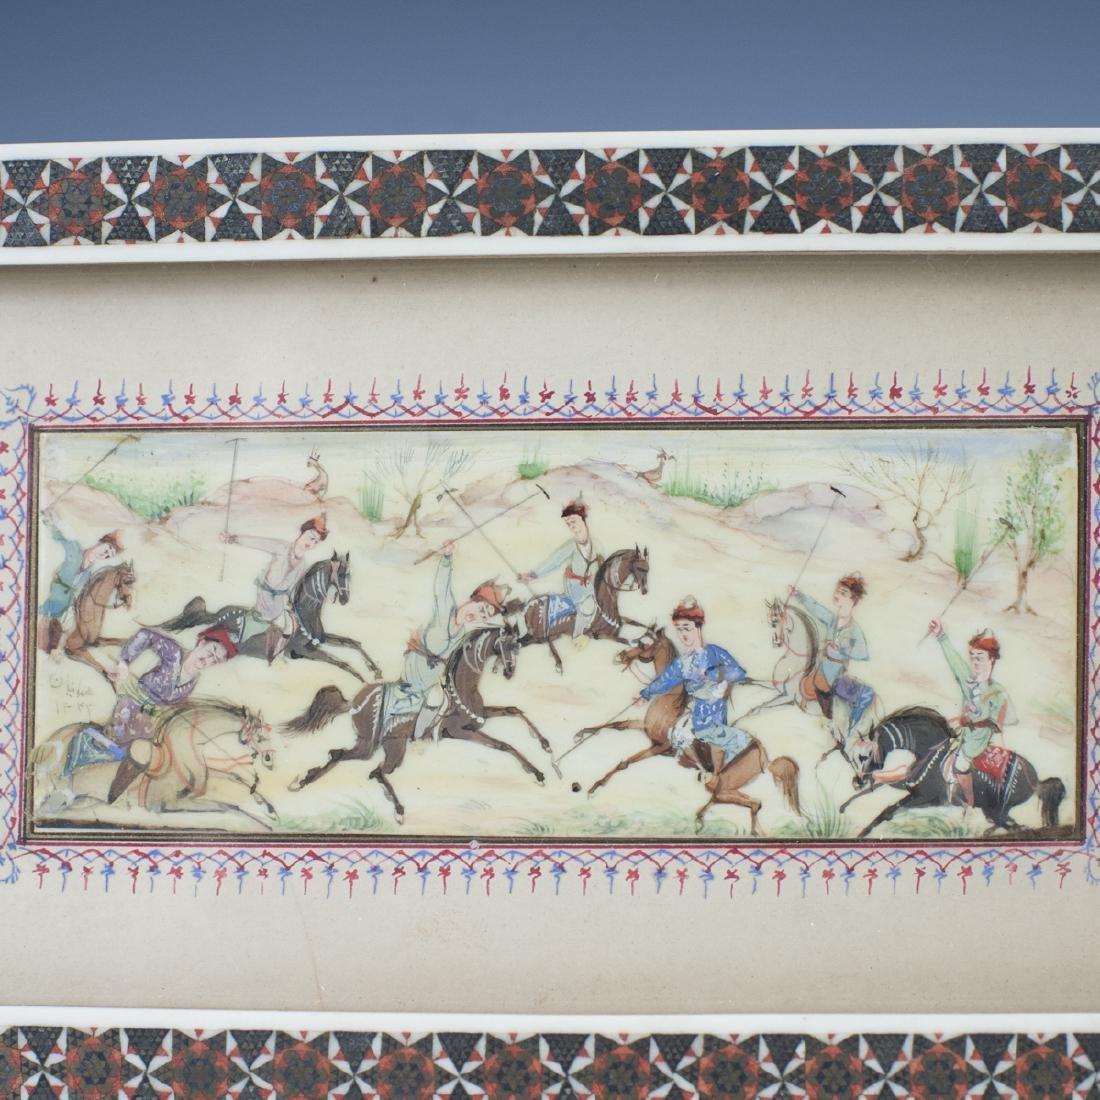 Persian Miniature Painting on Bone - 2